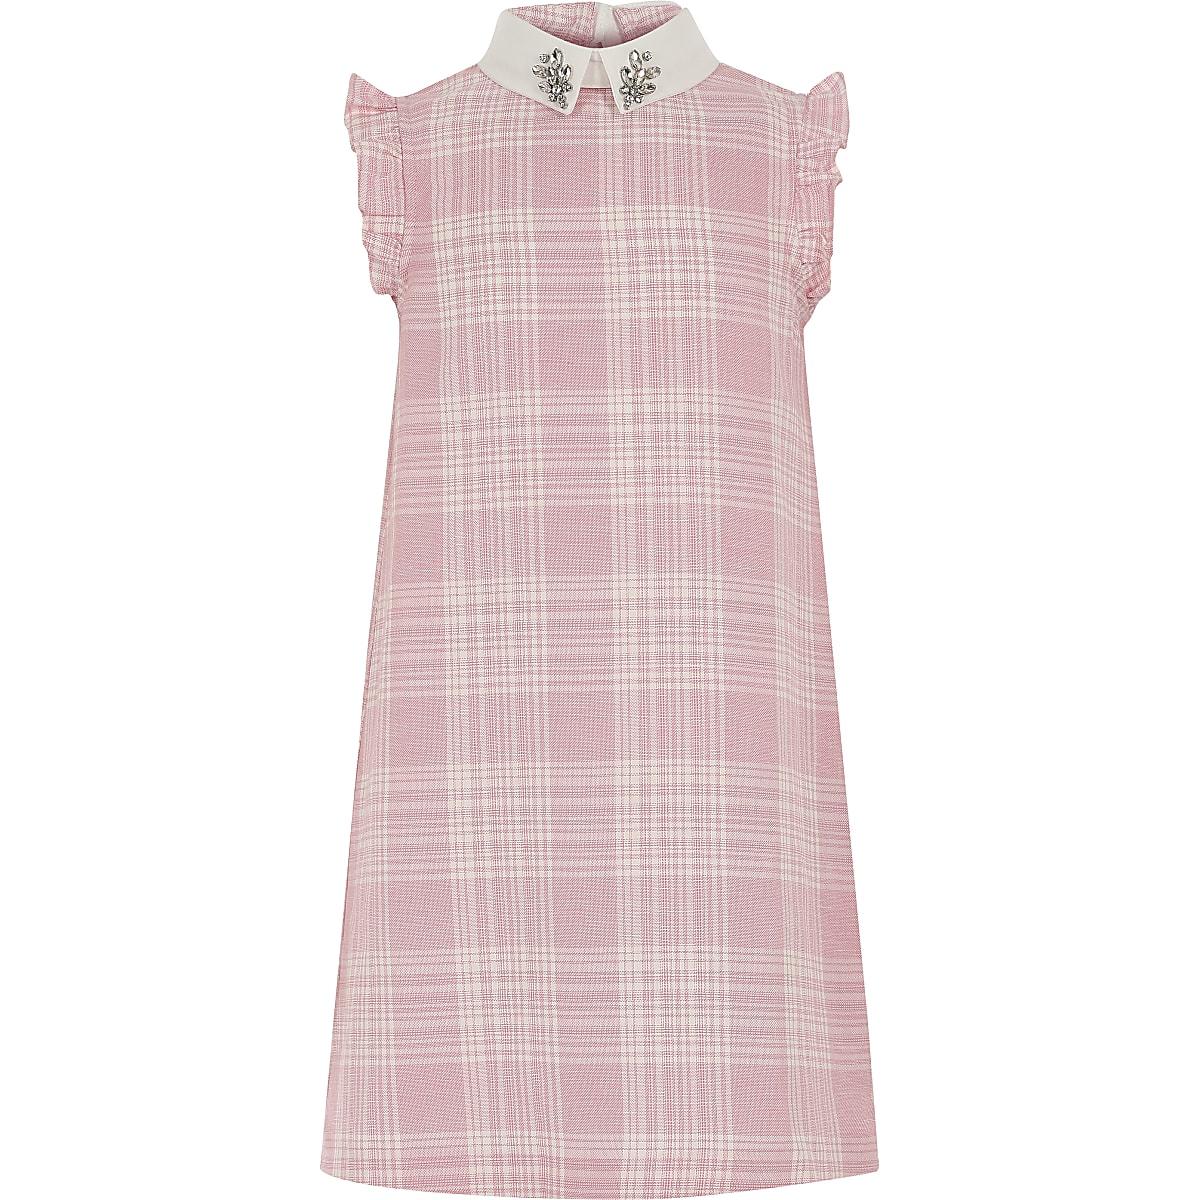 Girls pink check shift dress